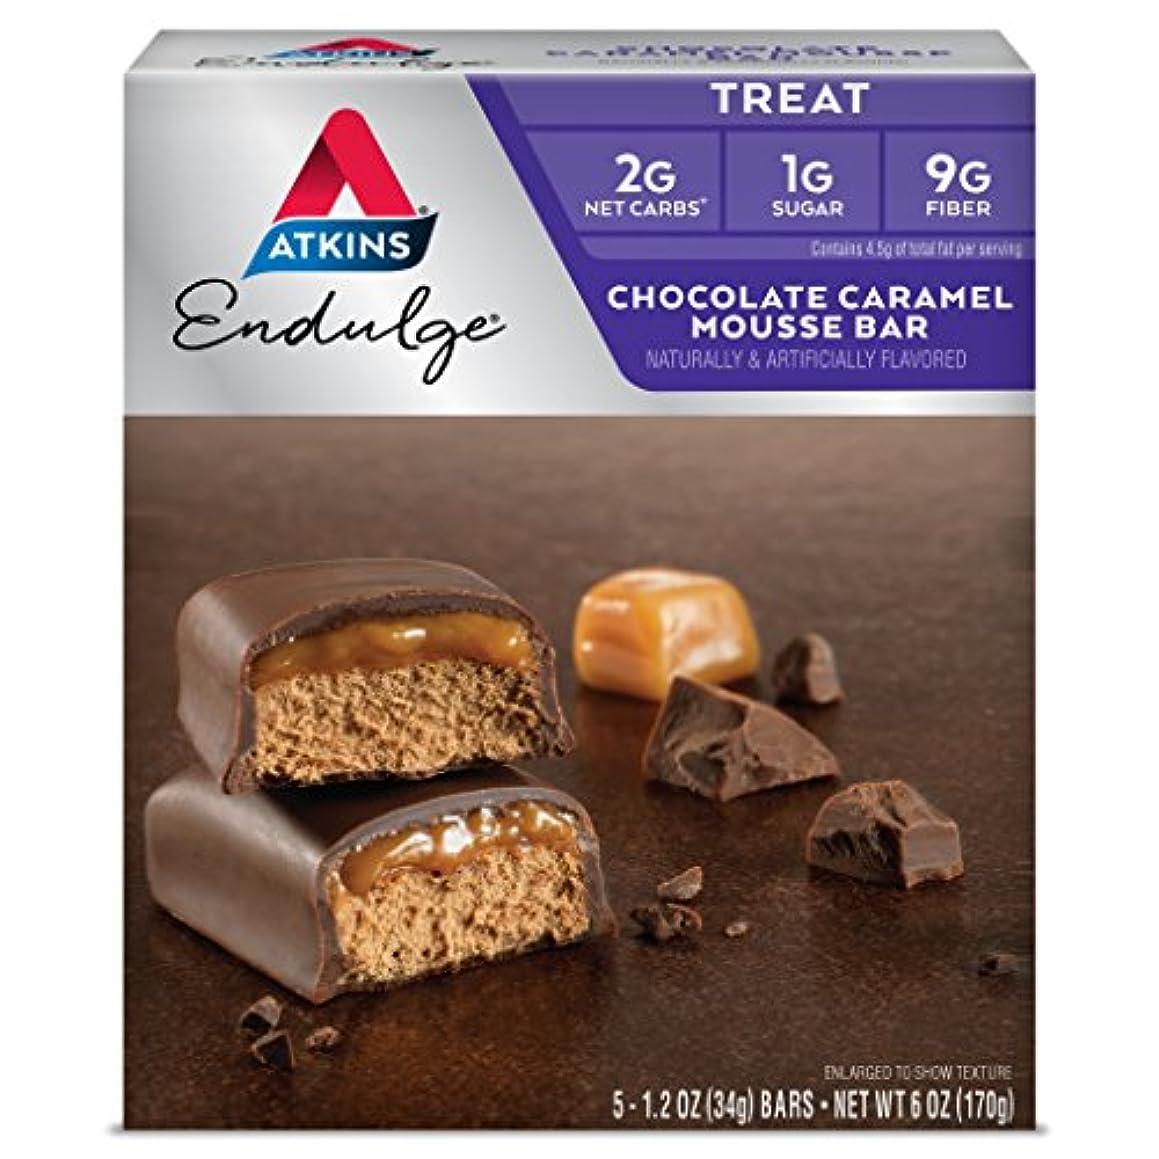 Atkins Endulge Treat, Chocolate Caramel Mousse Bar, Keto Friendly, 5 Count